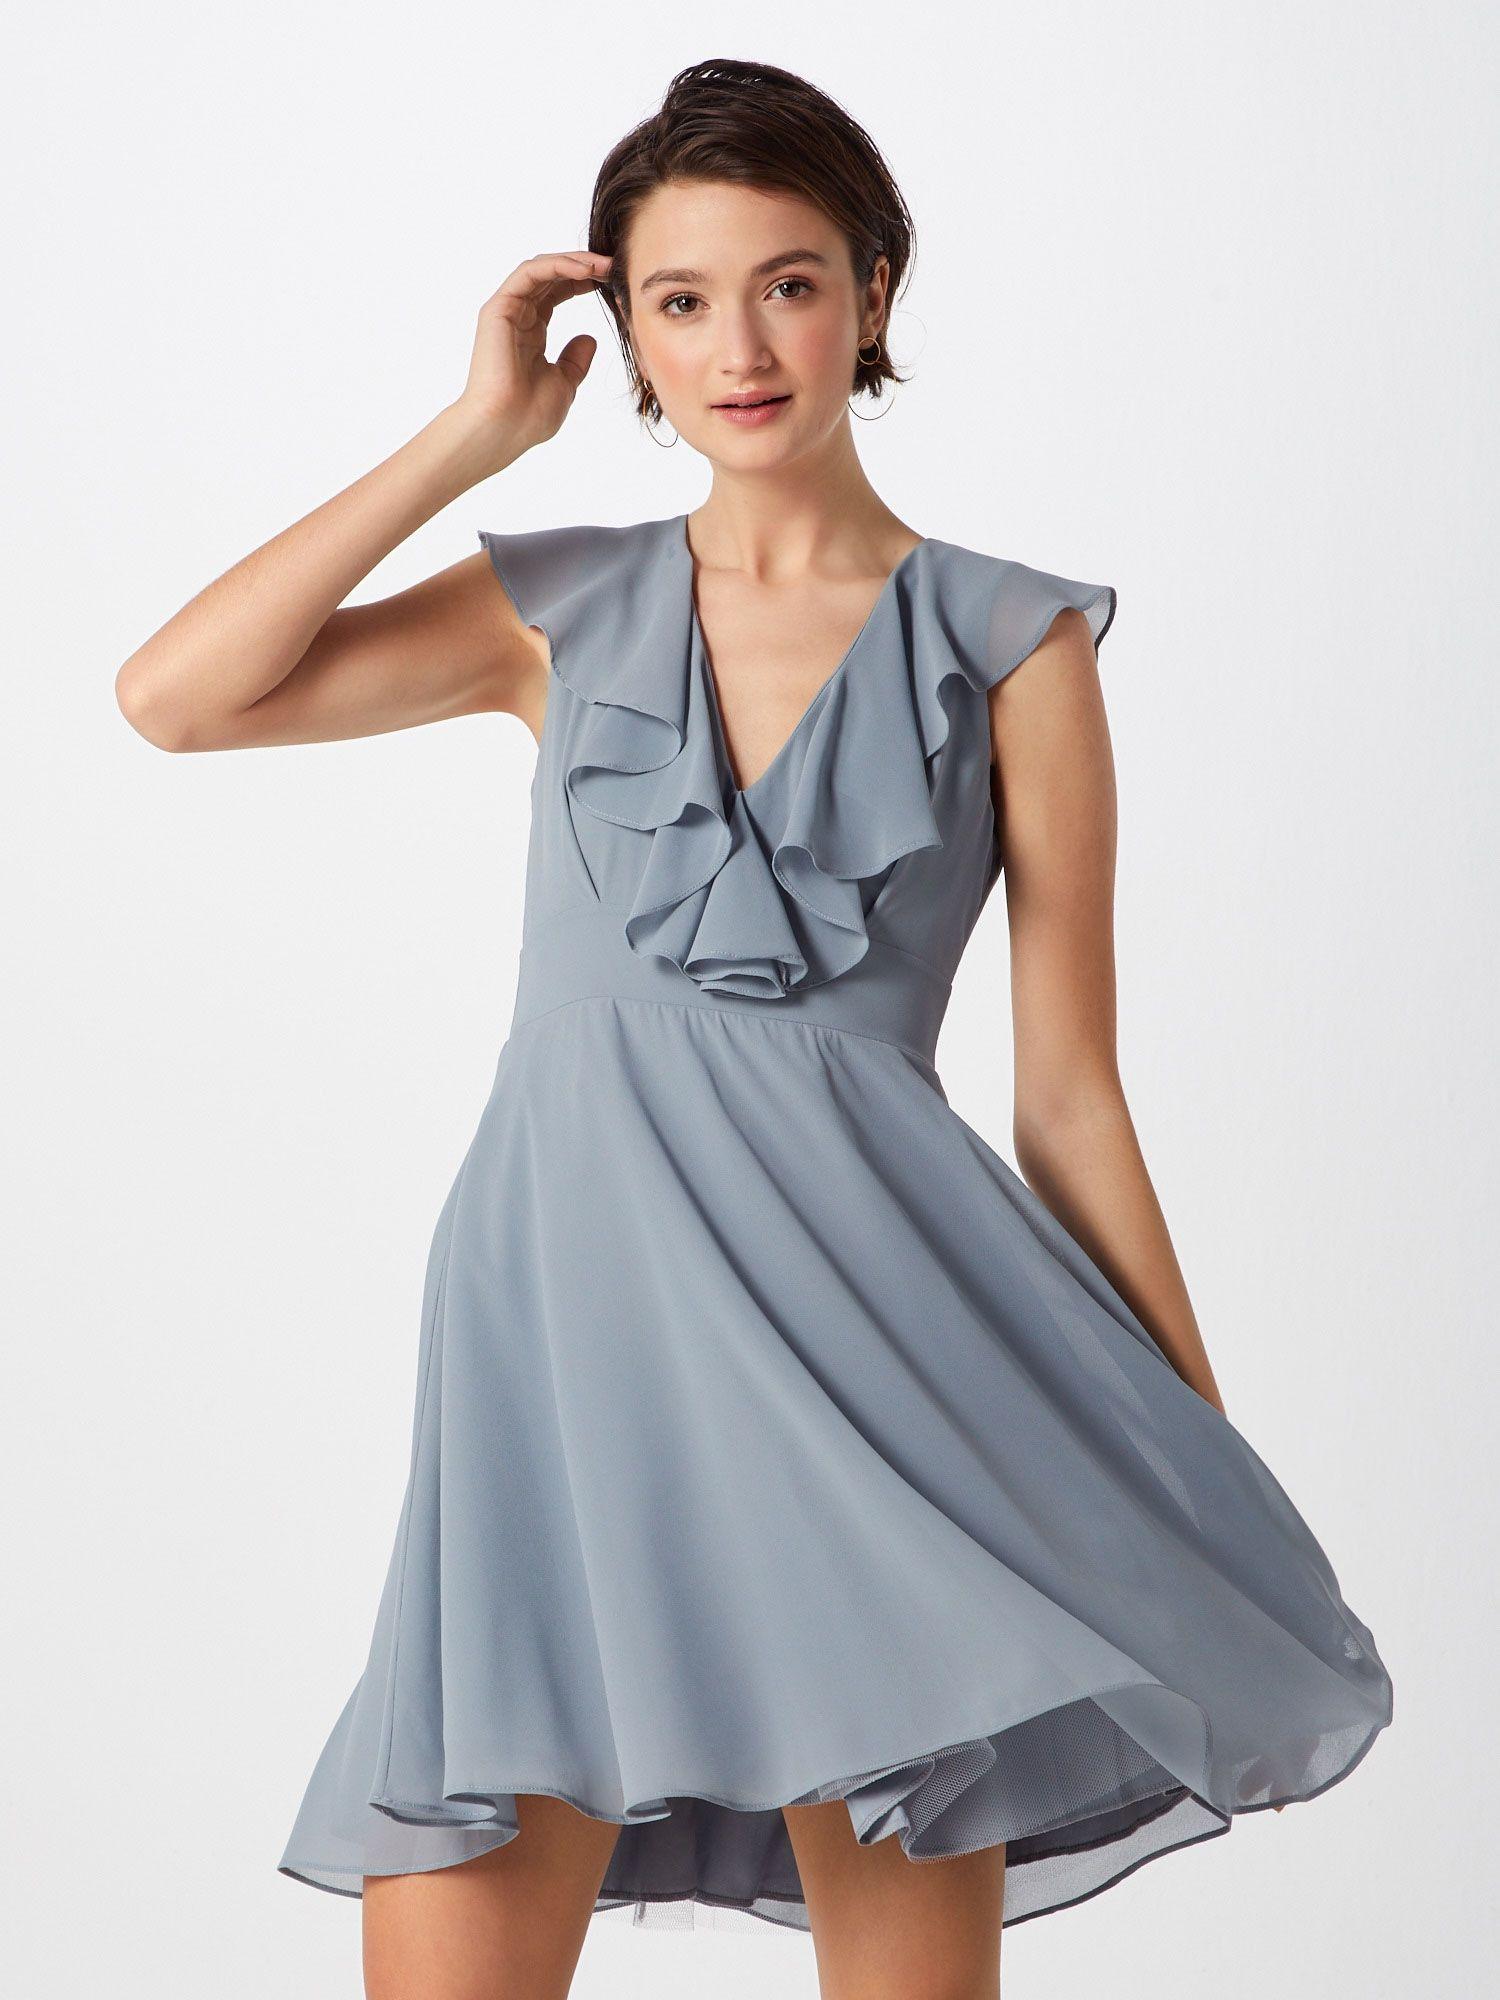 TFNC Kleid Damen, Blau / Grau, Größe 18  Modestil, Kleider, Blau grau